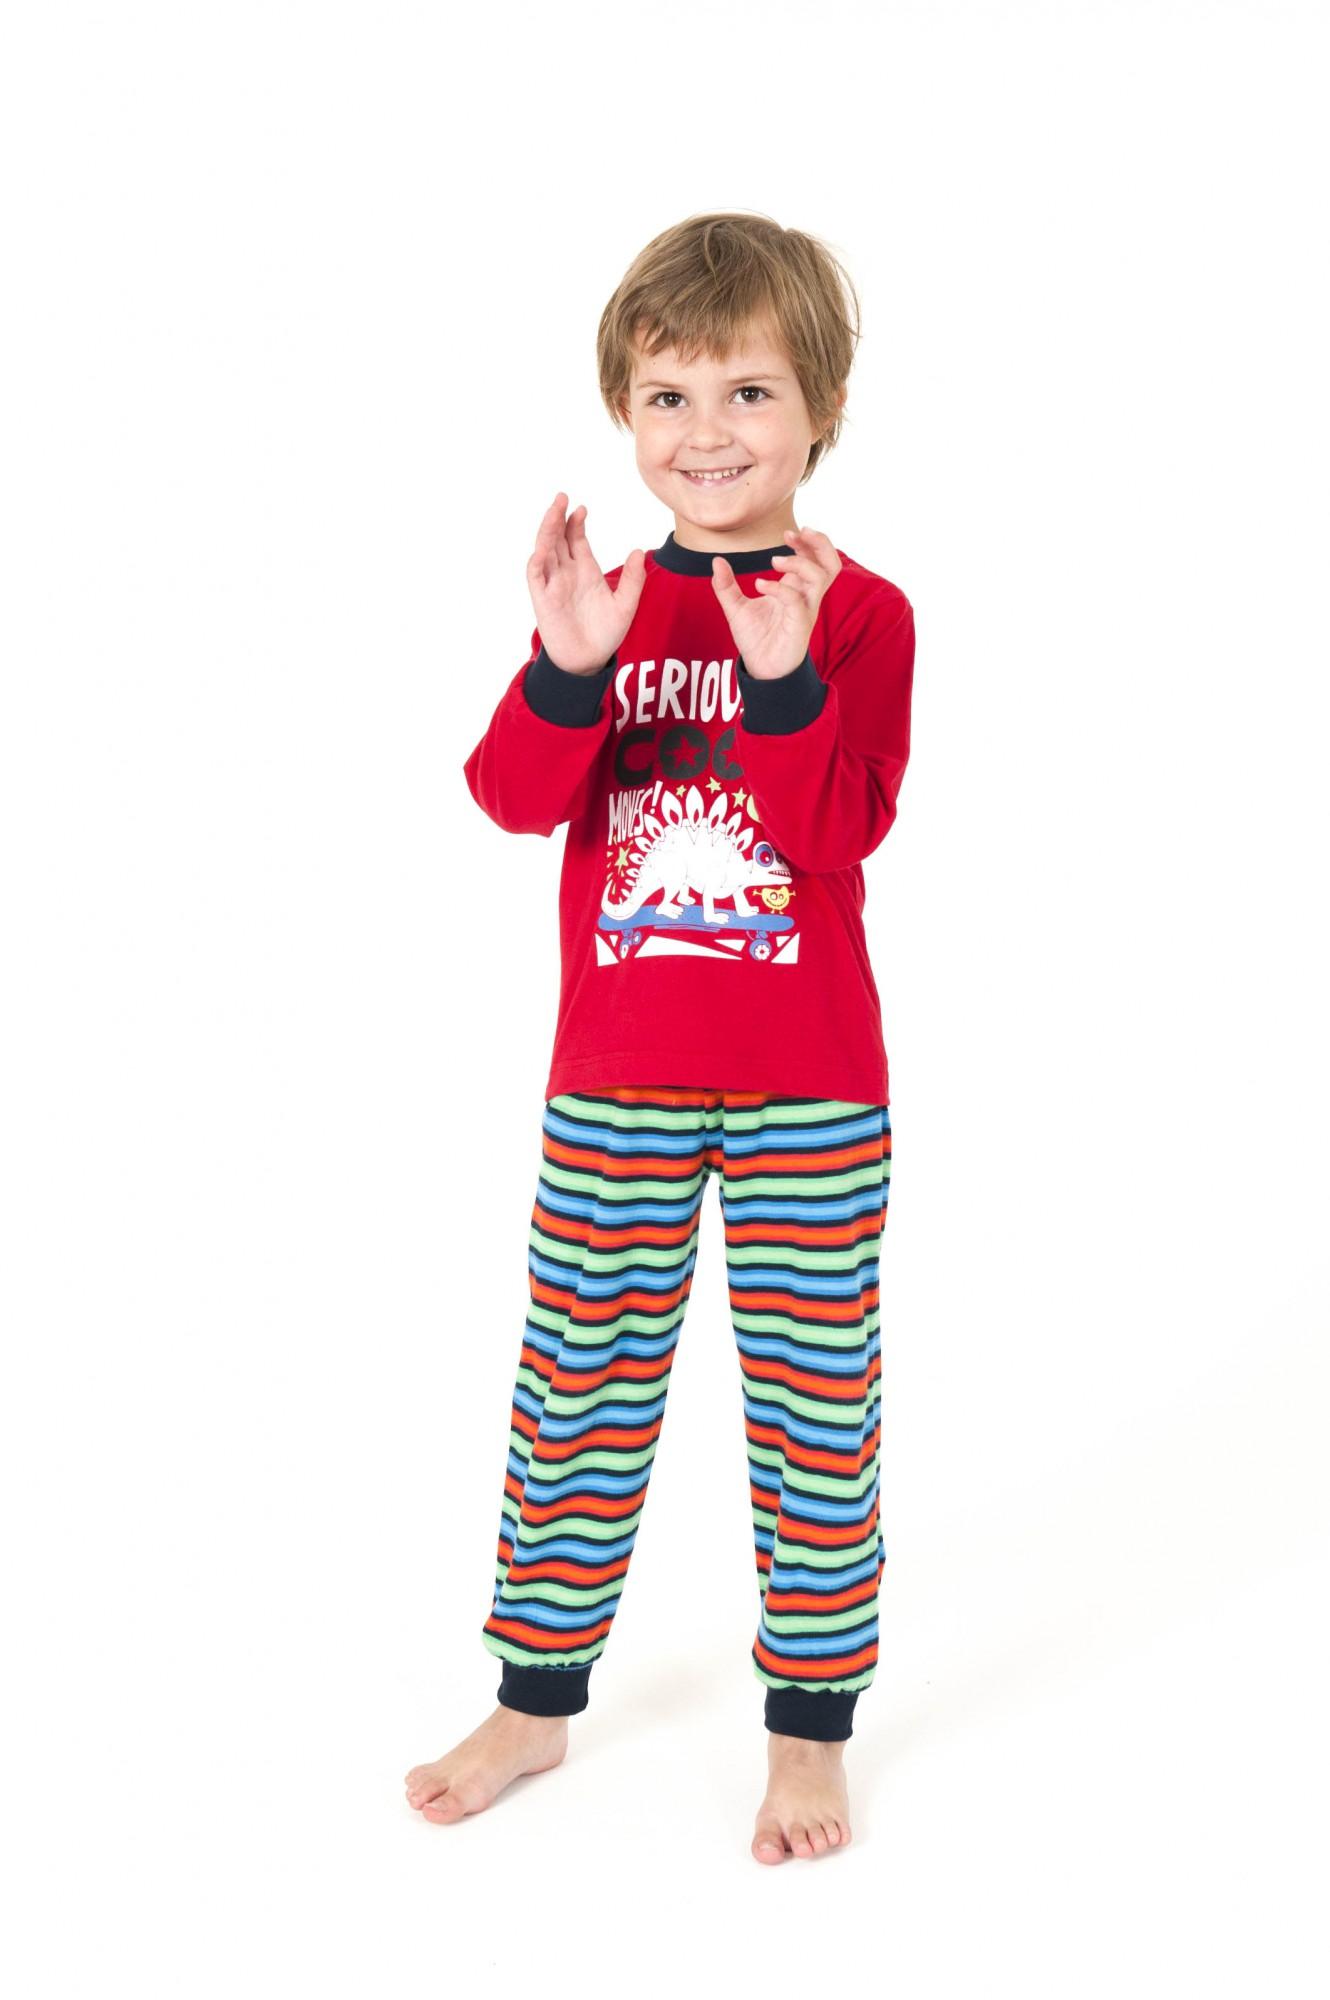 Jungen Pyjama langarm Hose geringelt – 161 801 90 741 – Bild 1